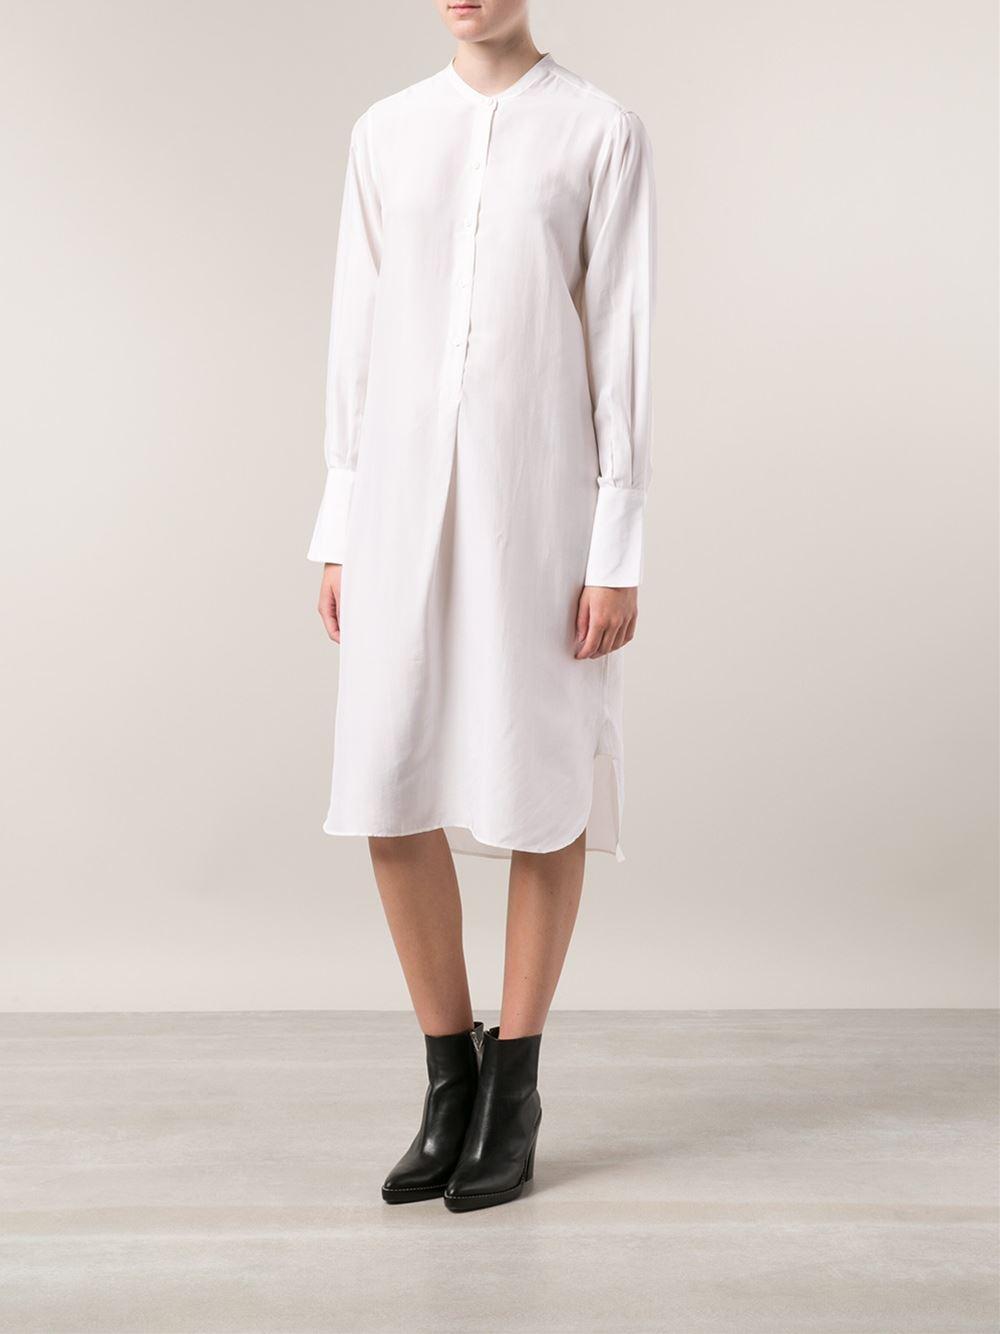 Christophe Lemaire Long Shirt Dress in White